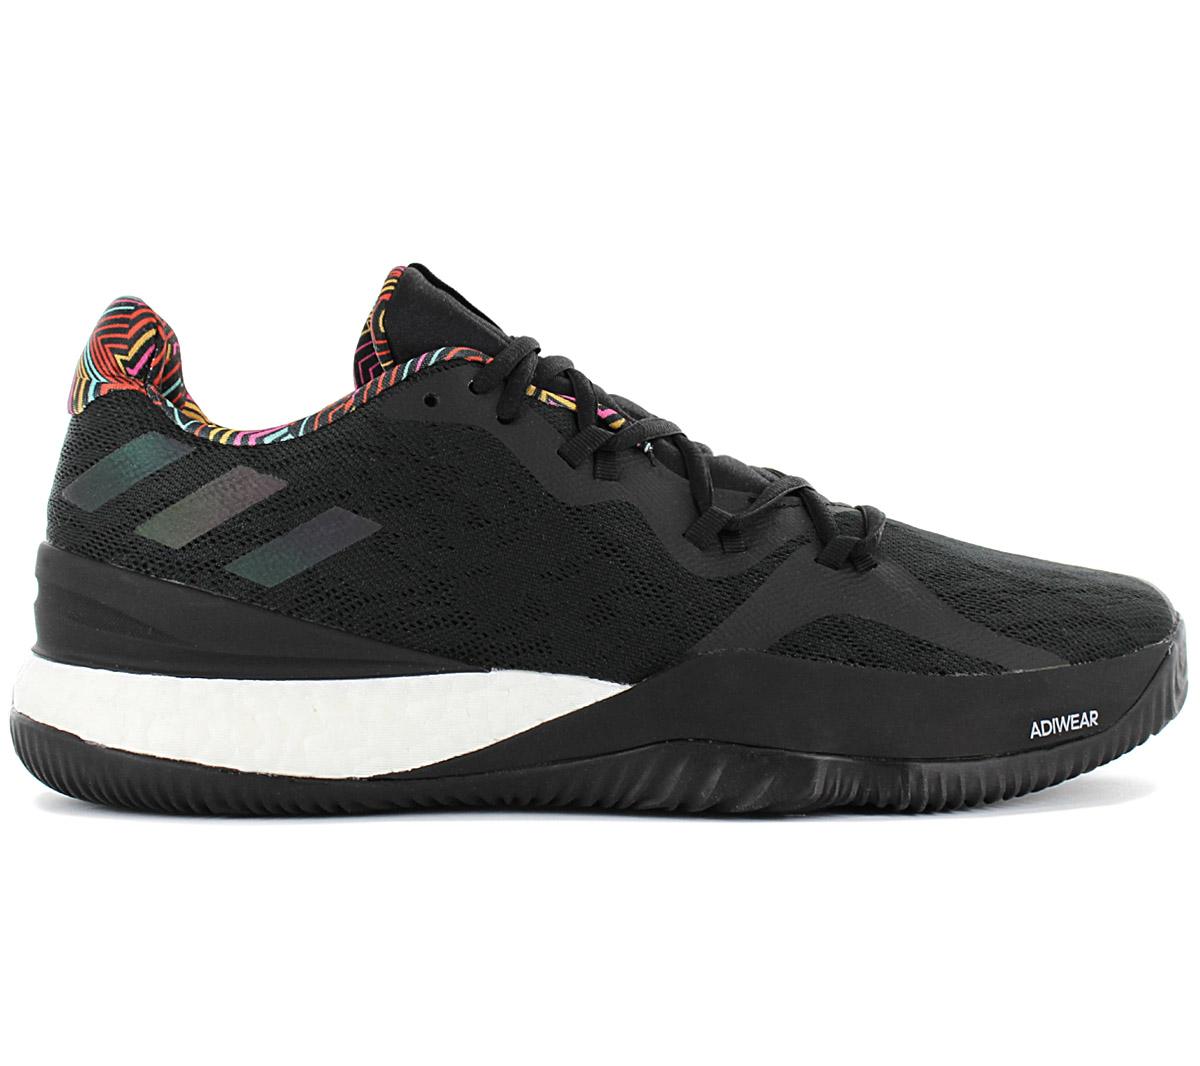 vena Honestidad Centro de niños  Adidas crazy light Boost 2018 - summer pack - B43799 Men's Basketball Shoes  New | eBay